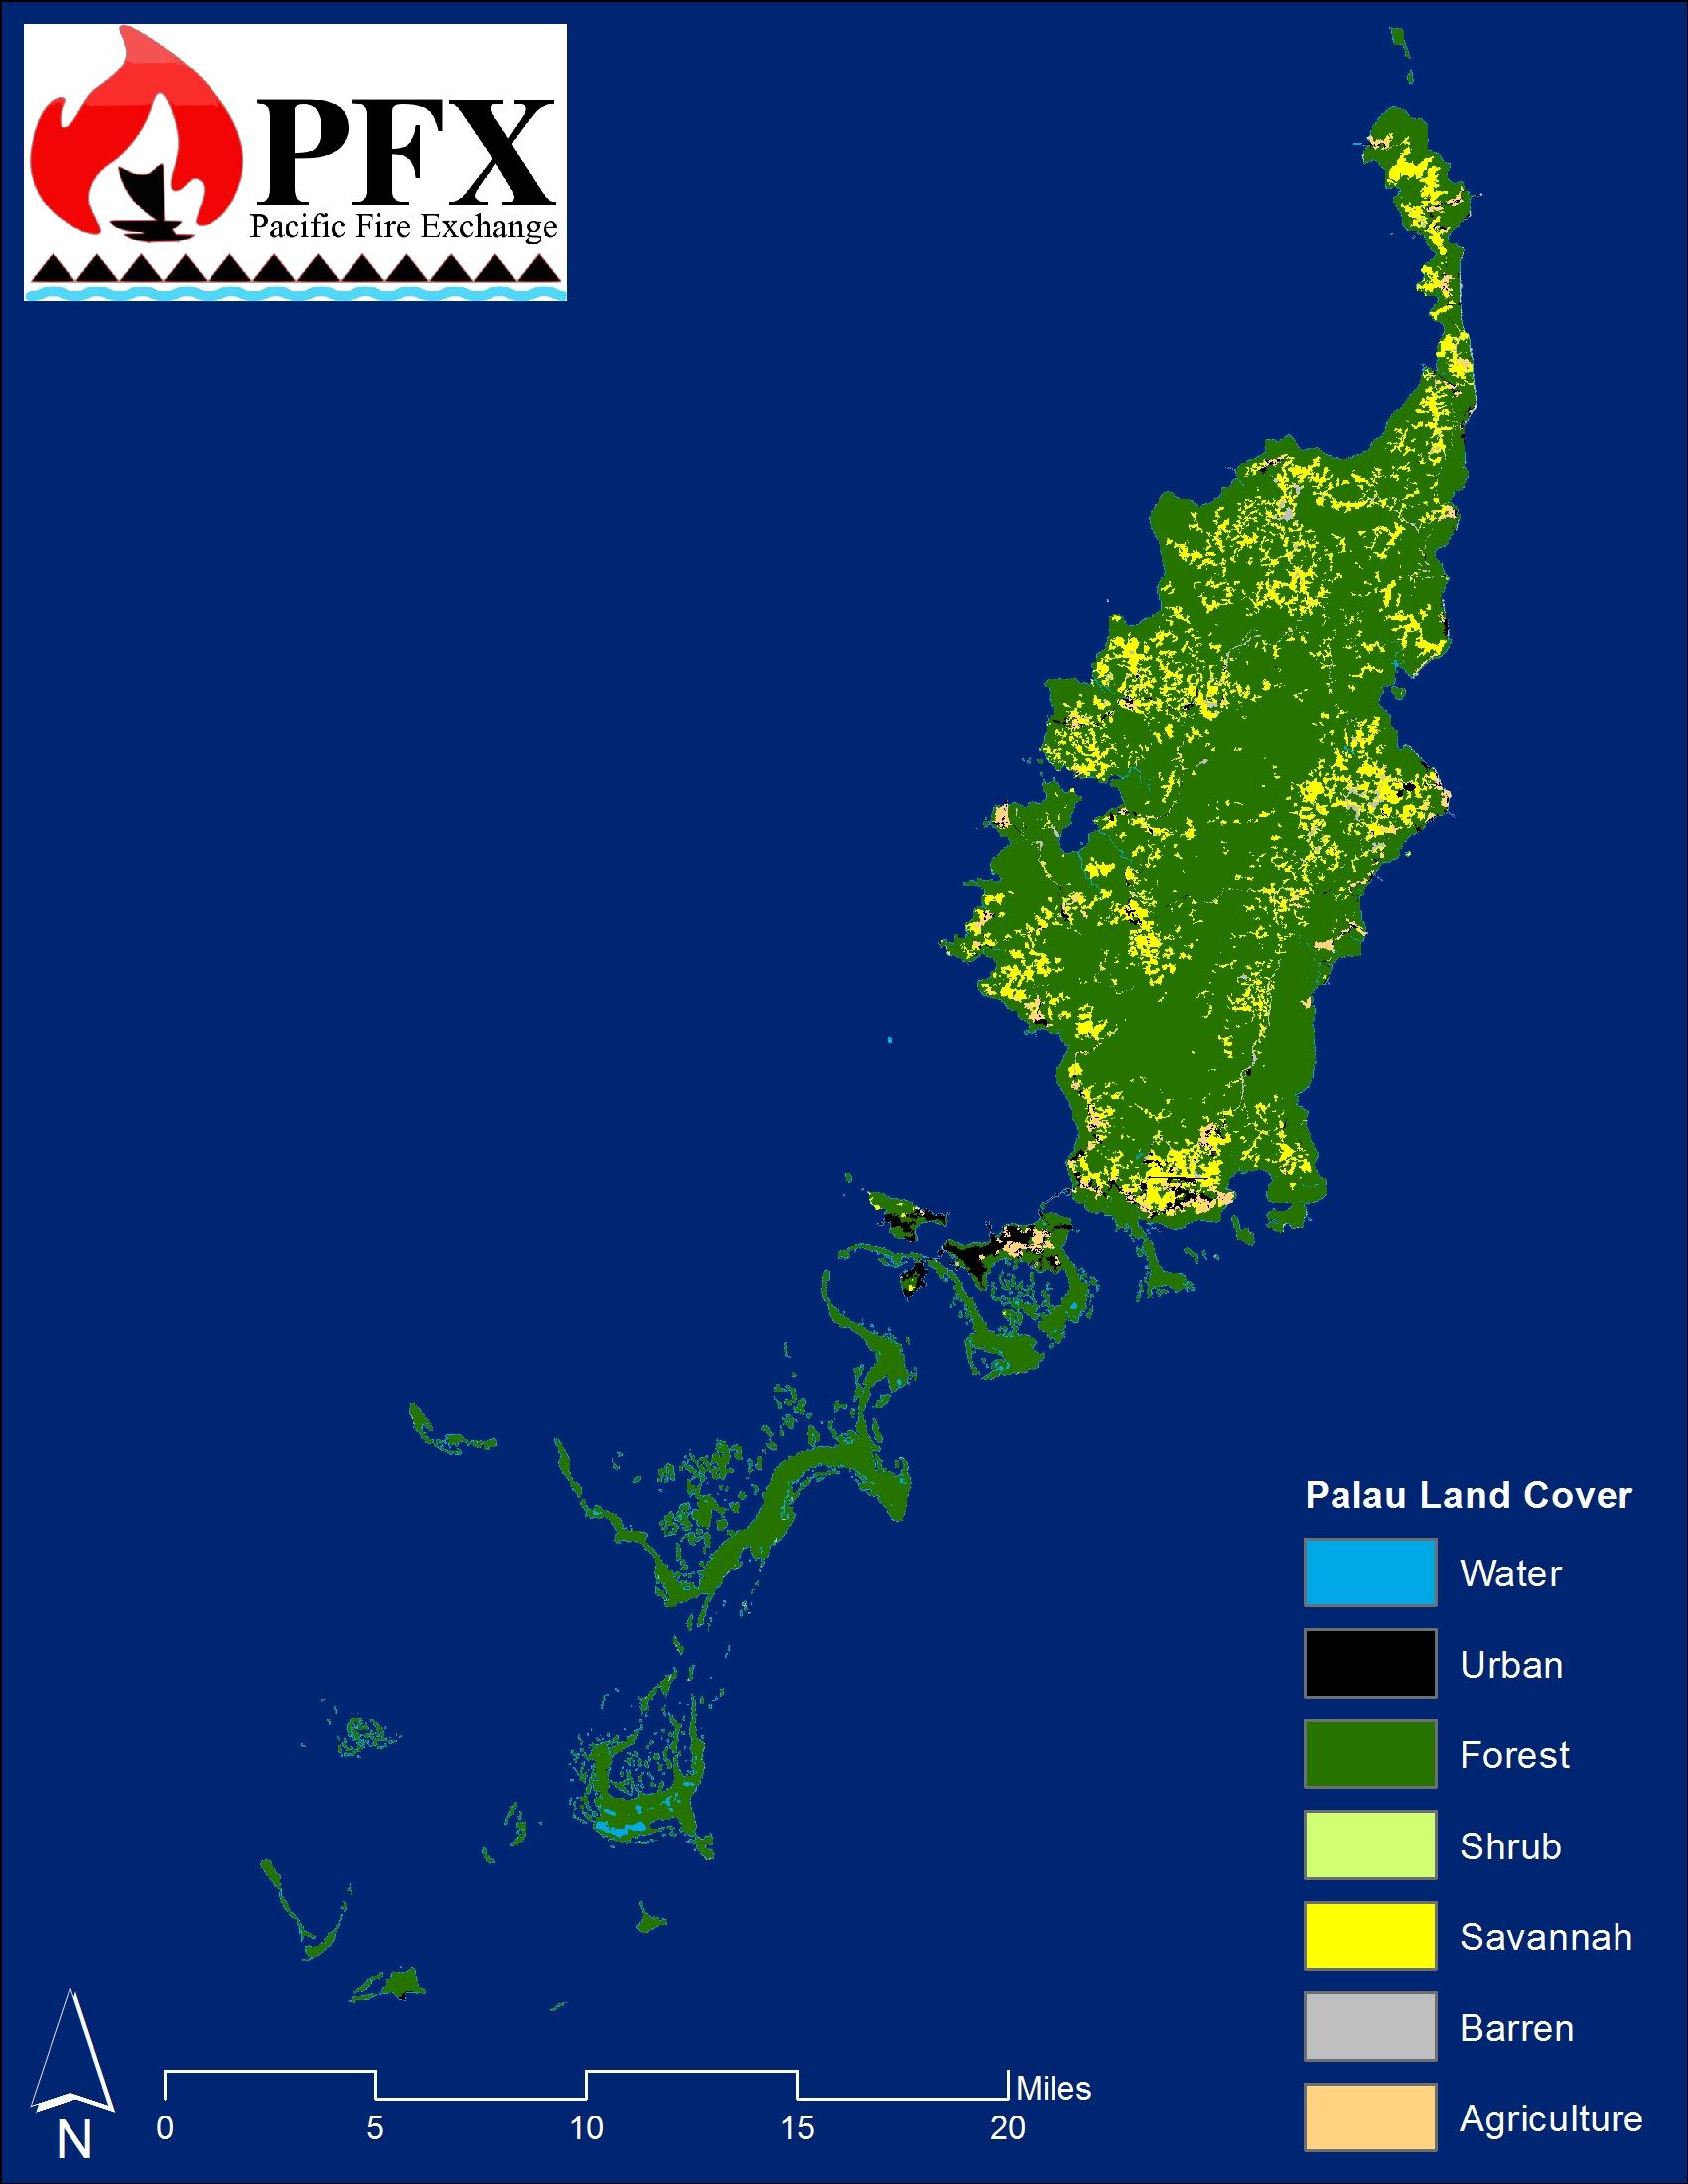 Palau_land_cover_PFX